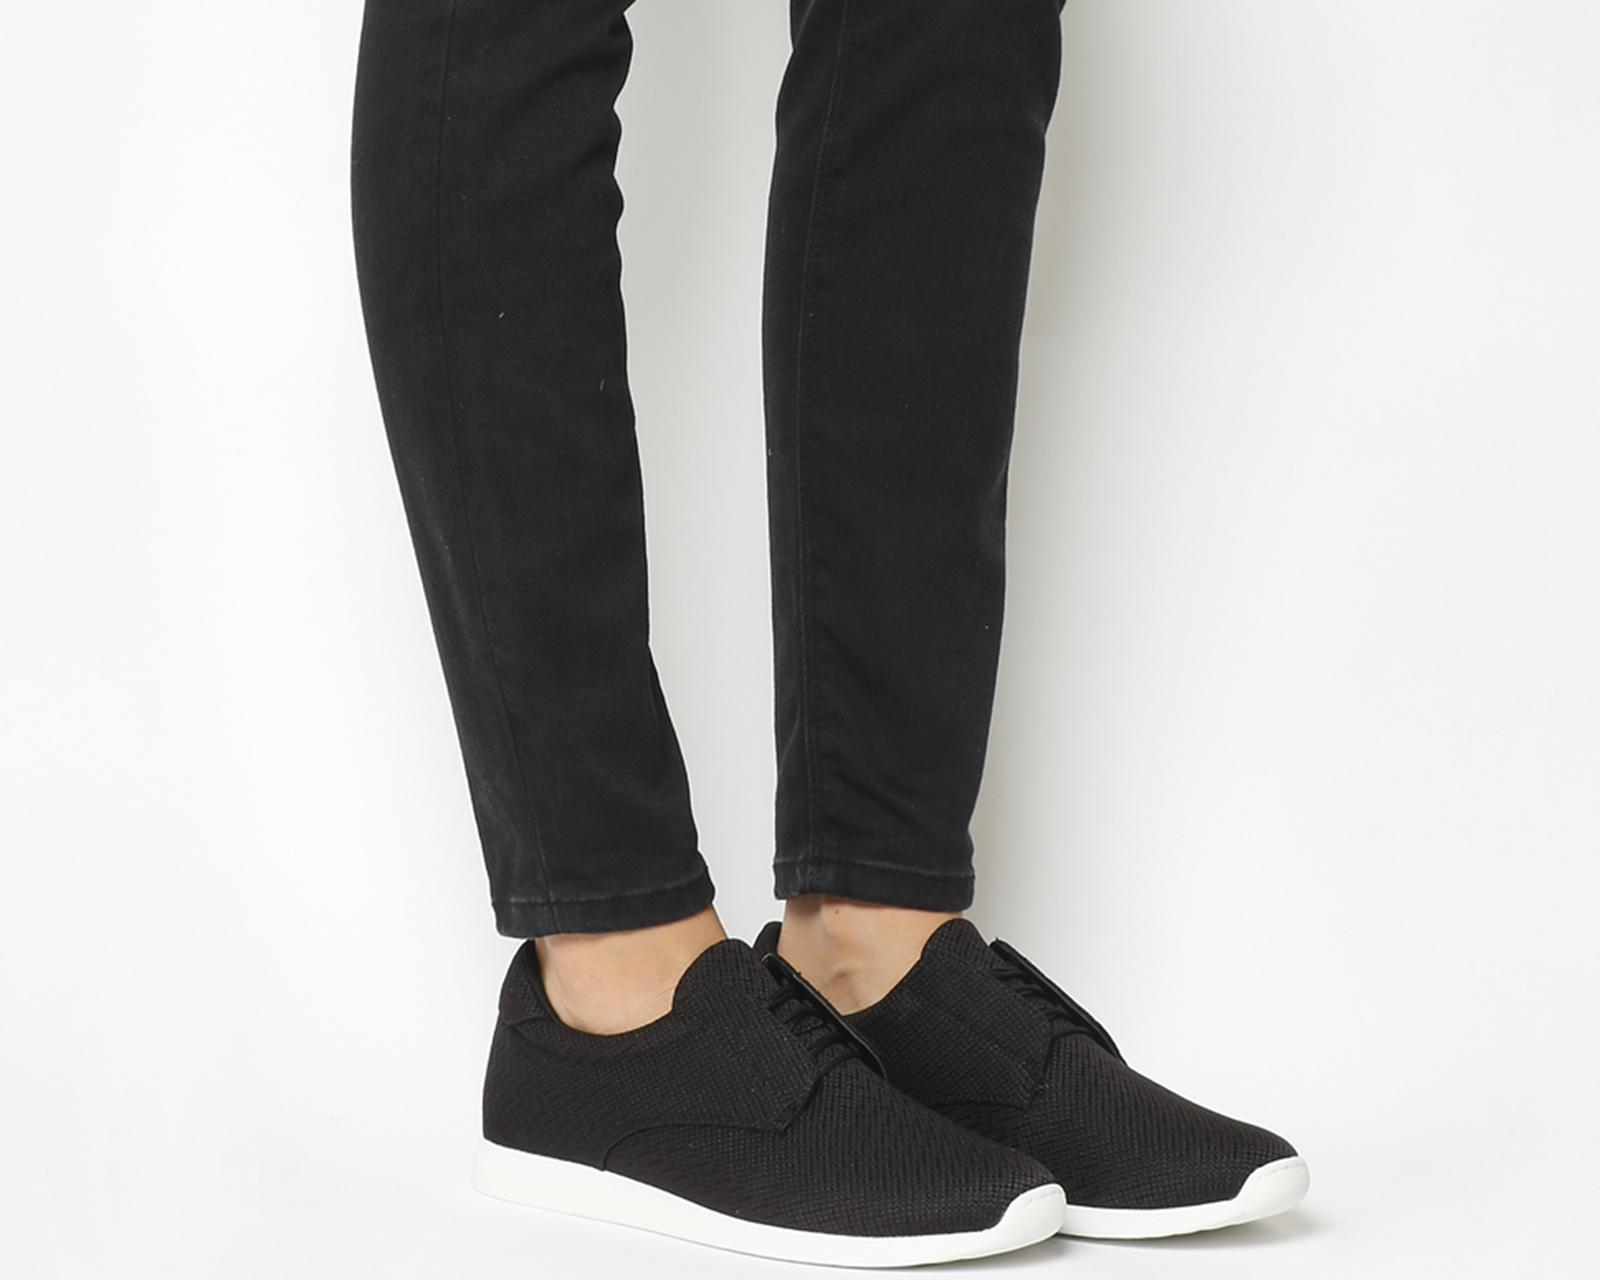 07b648887b2 CENTINELA Corredores de encaje para mujer Vagabond Kasai 2.0 negro zapatillas  zapatos